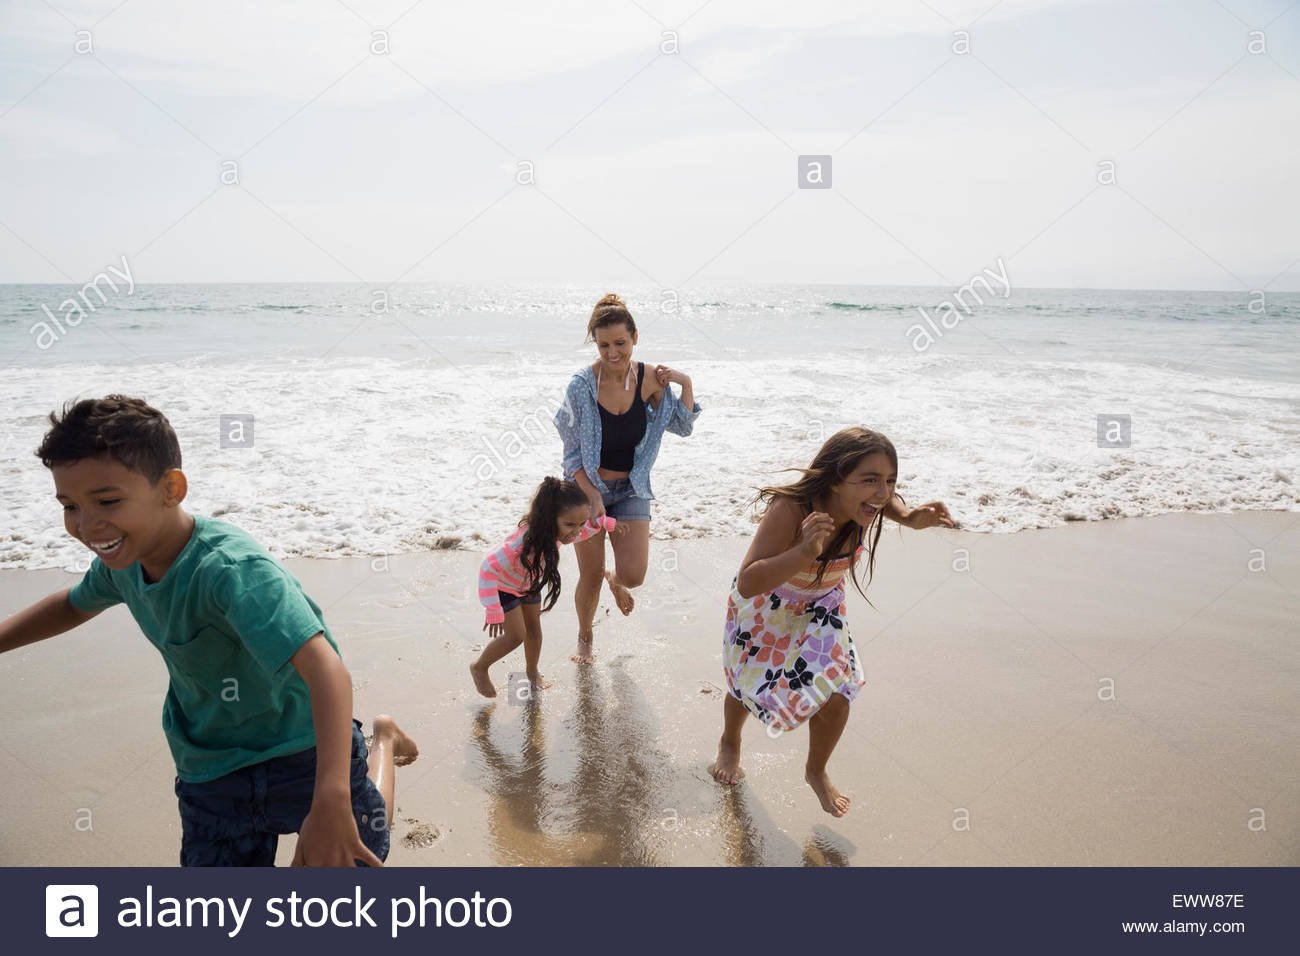 Family running from ocean onto sunny beach - Stock Image